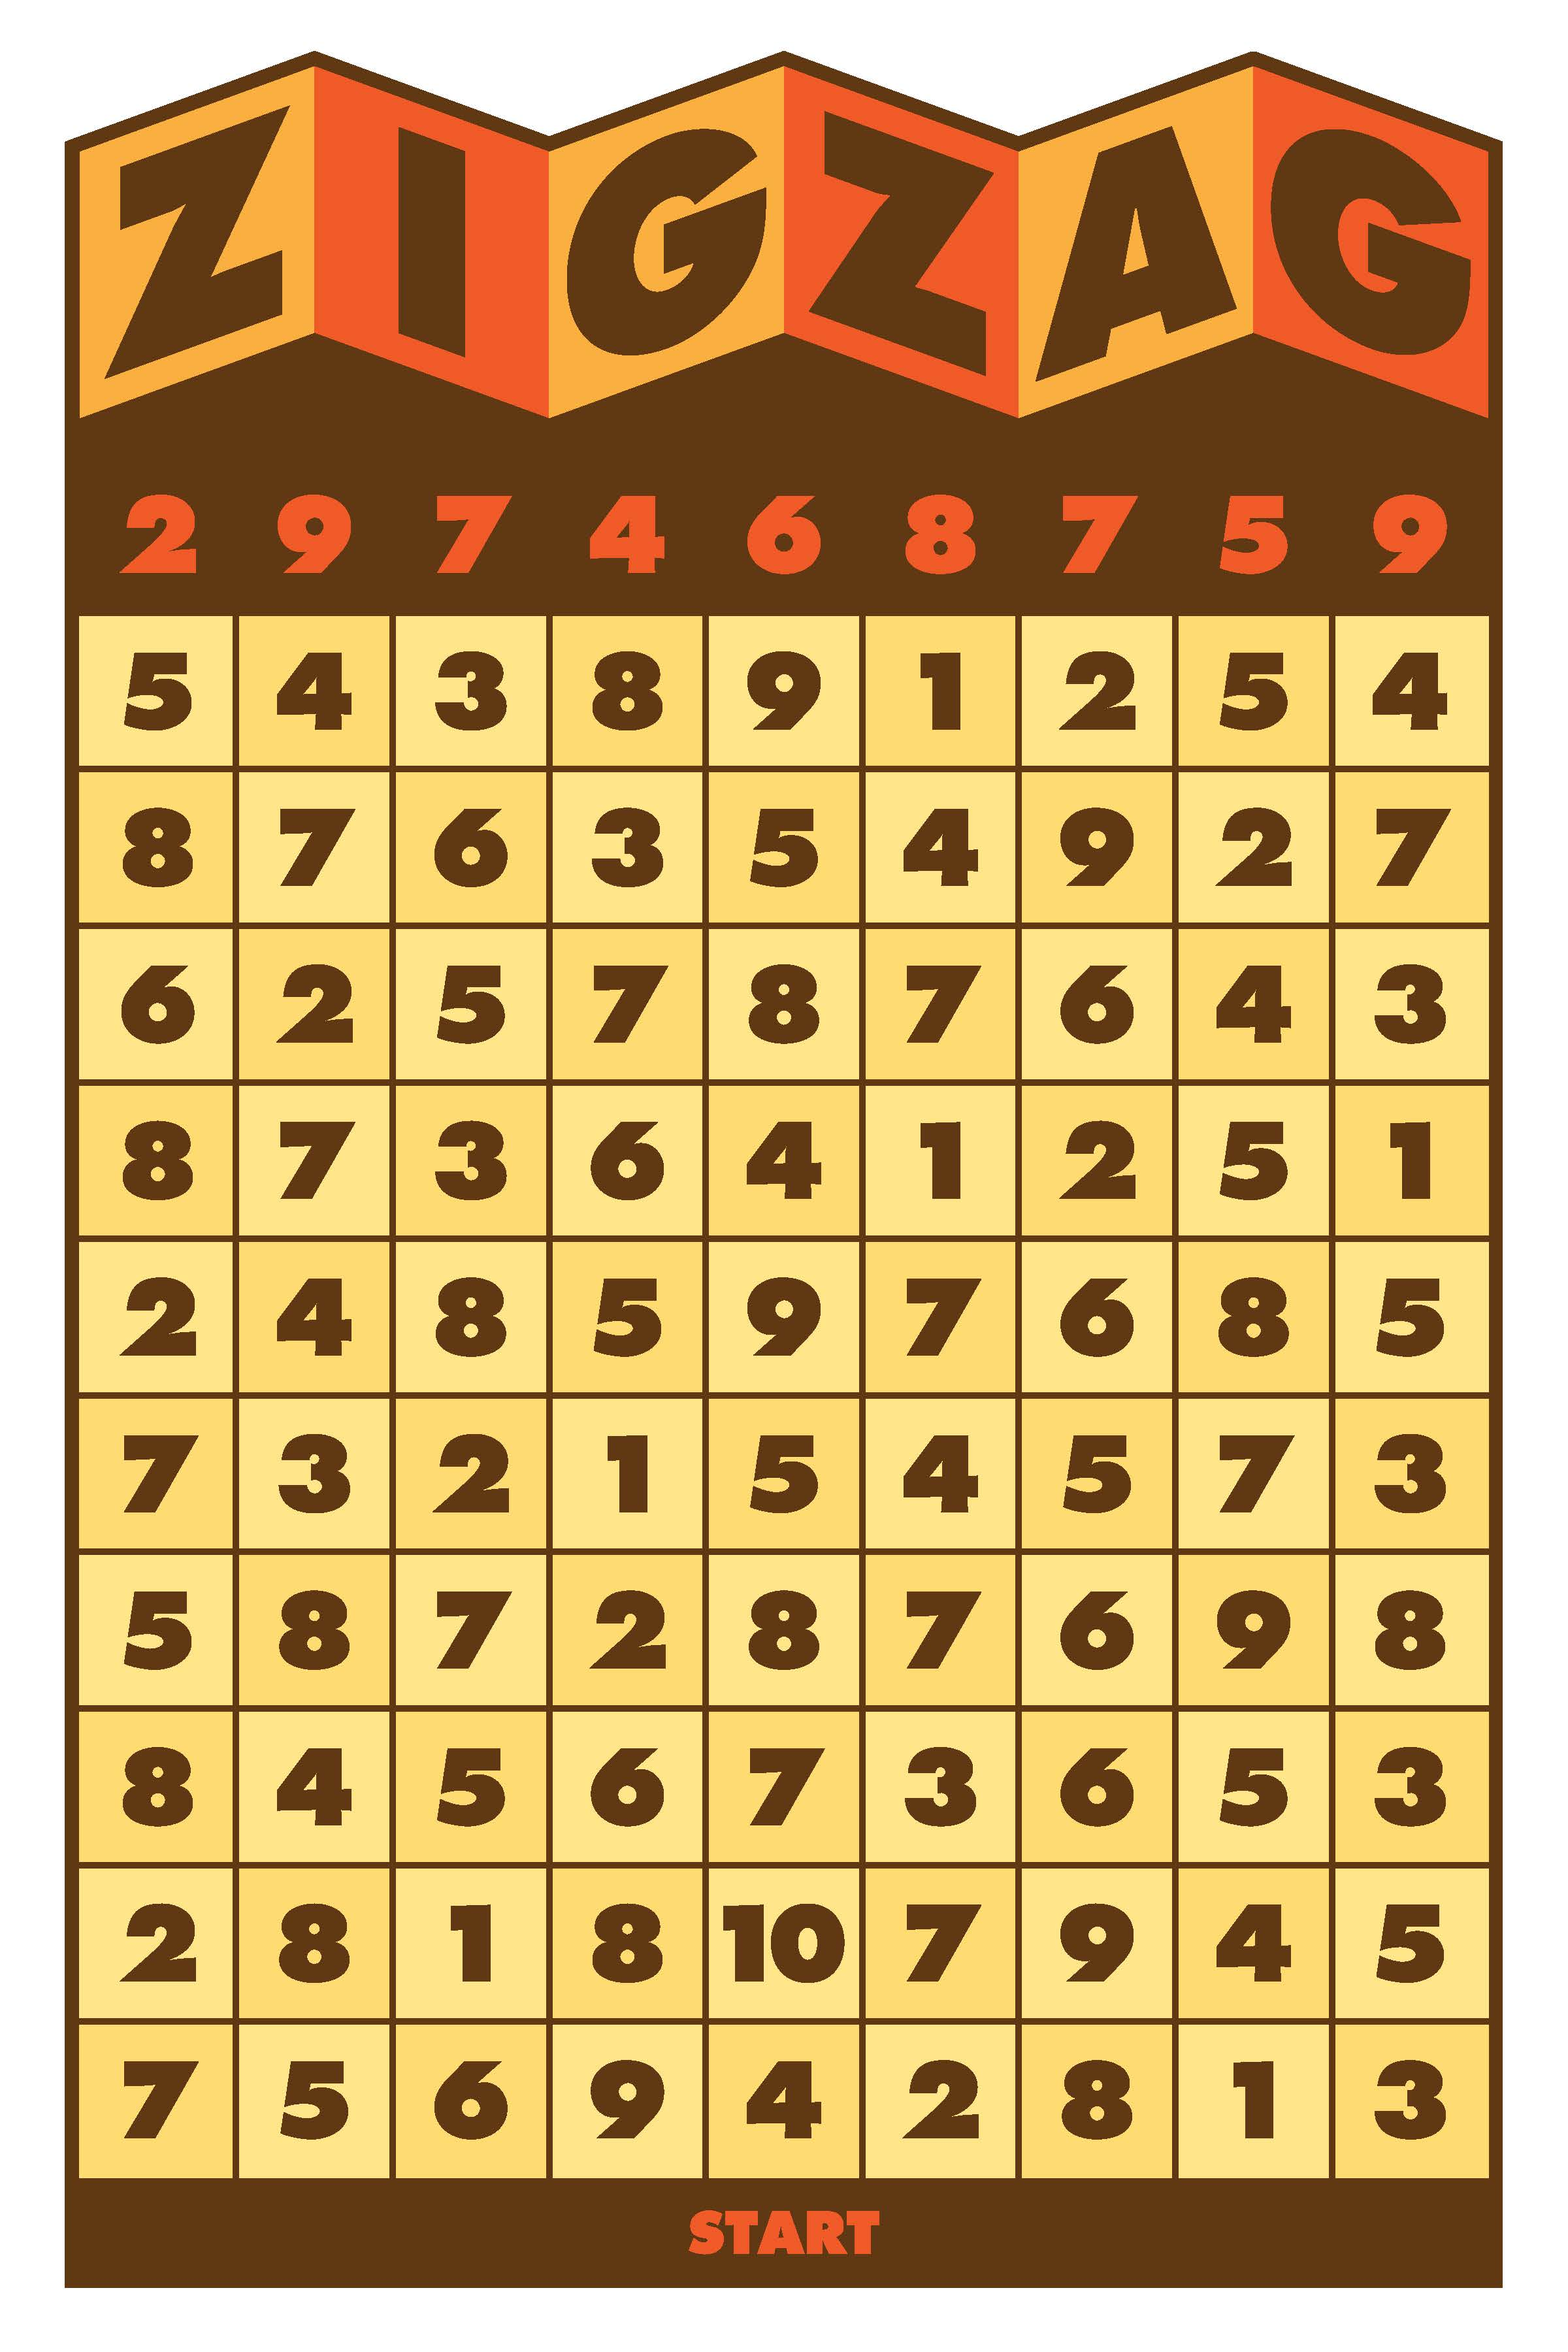 ZigZag game